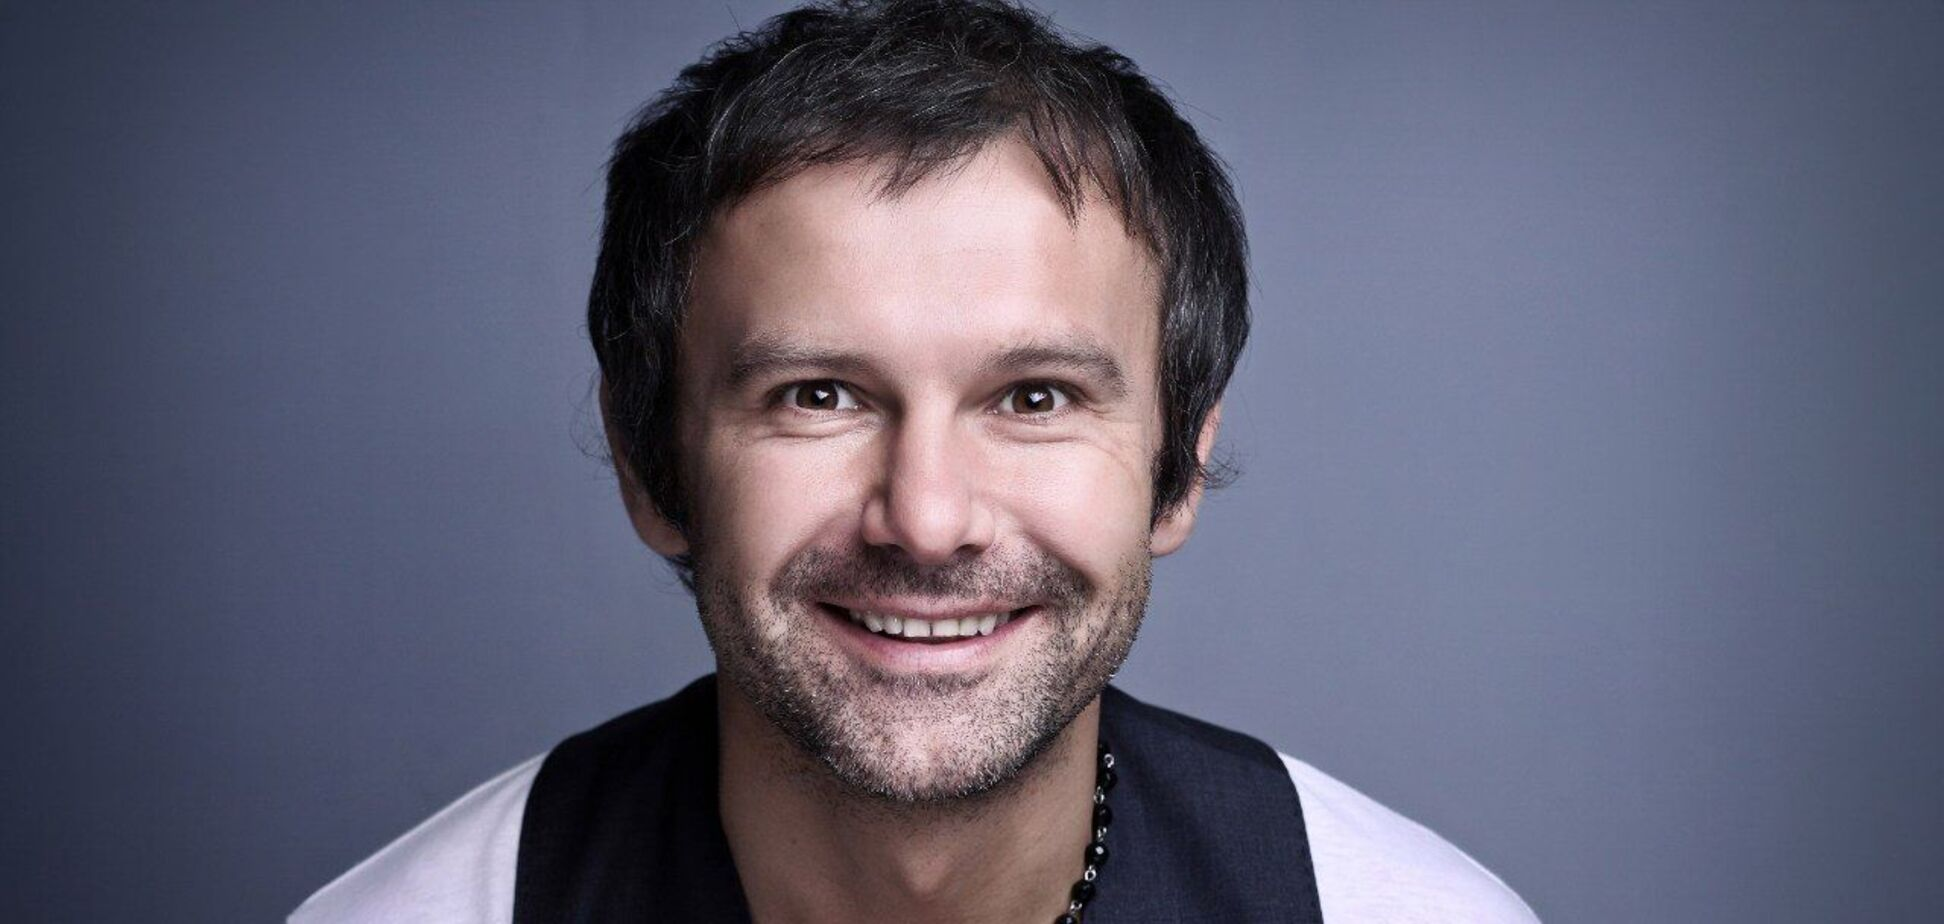 Український музикант Святослав Вакарчук